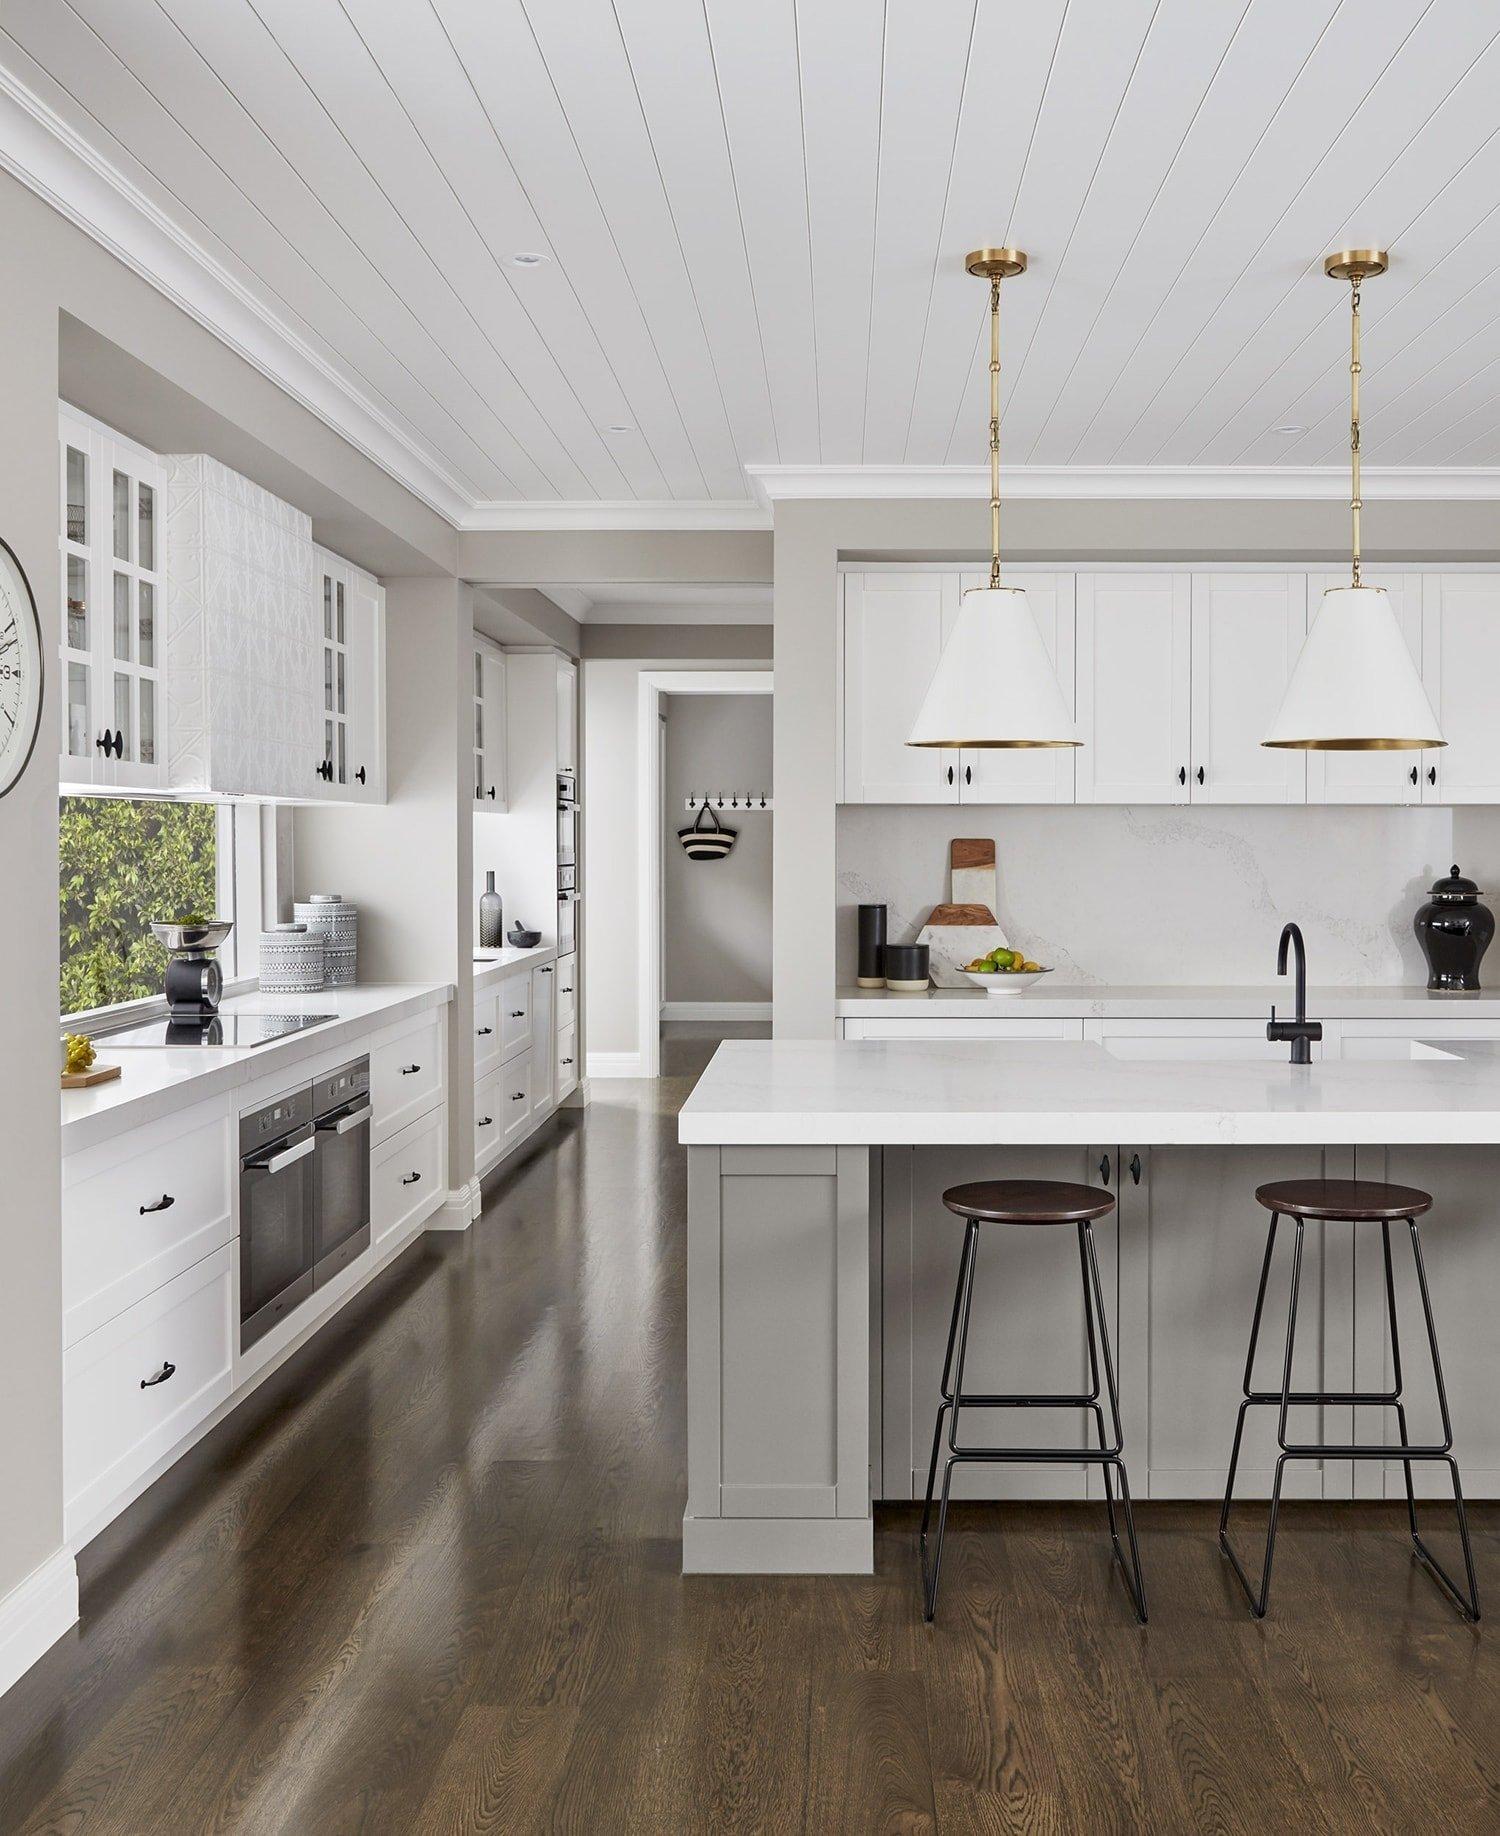 metricon bayville display home hamptons style kitchen